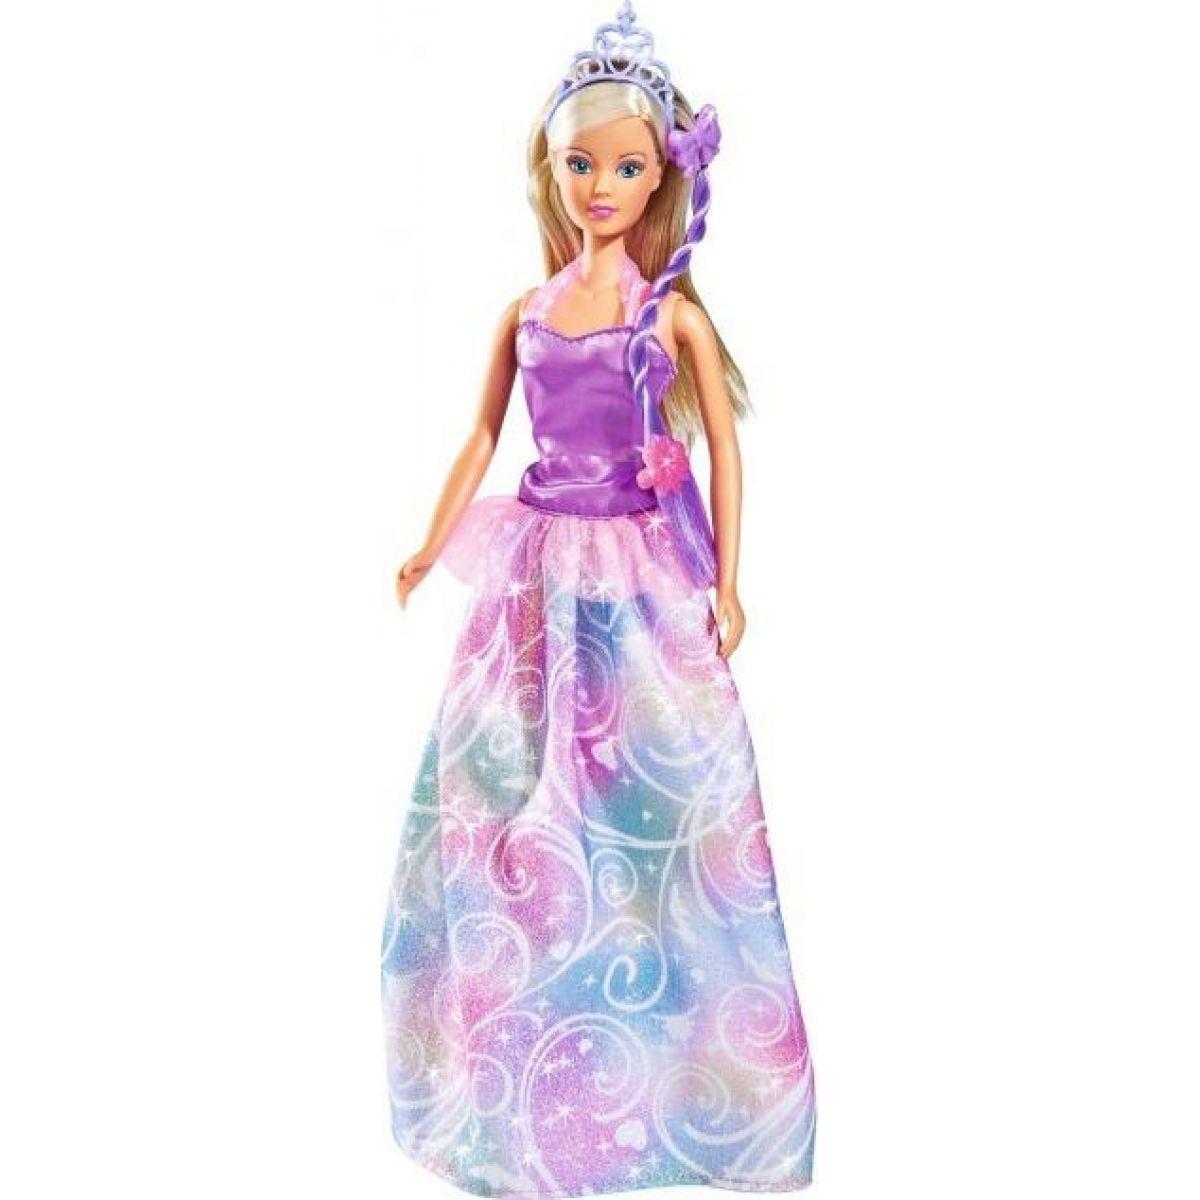 Steffi Love Panenka Hair Twister Princess